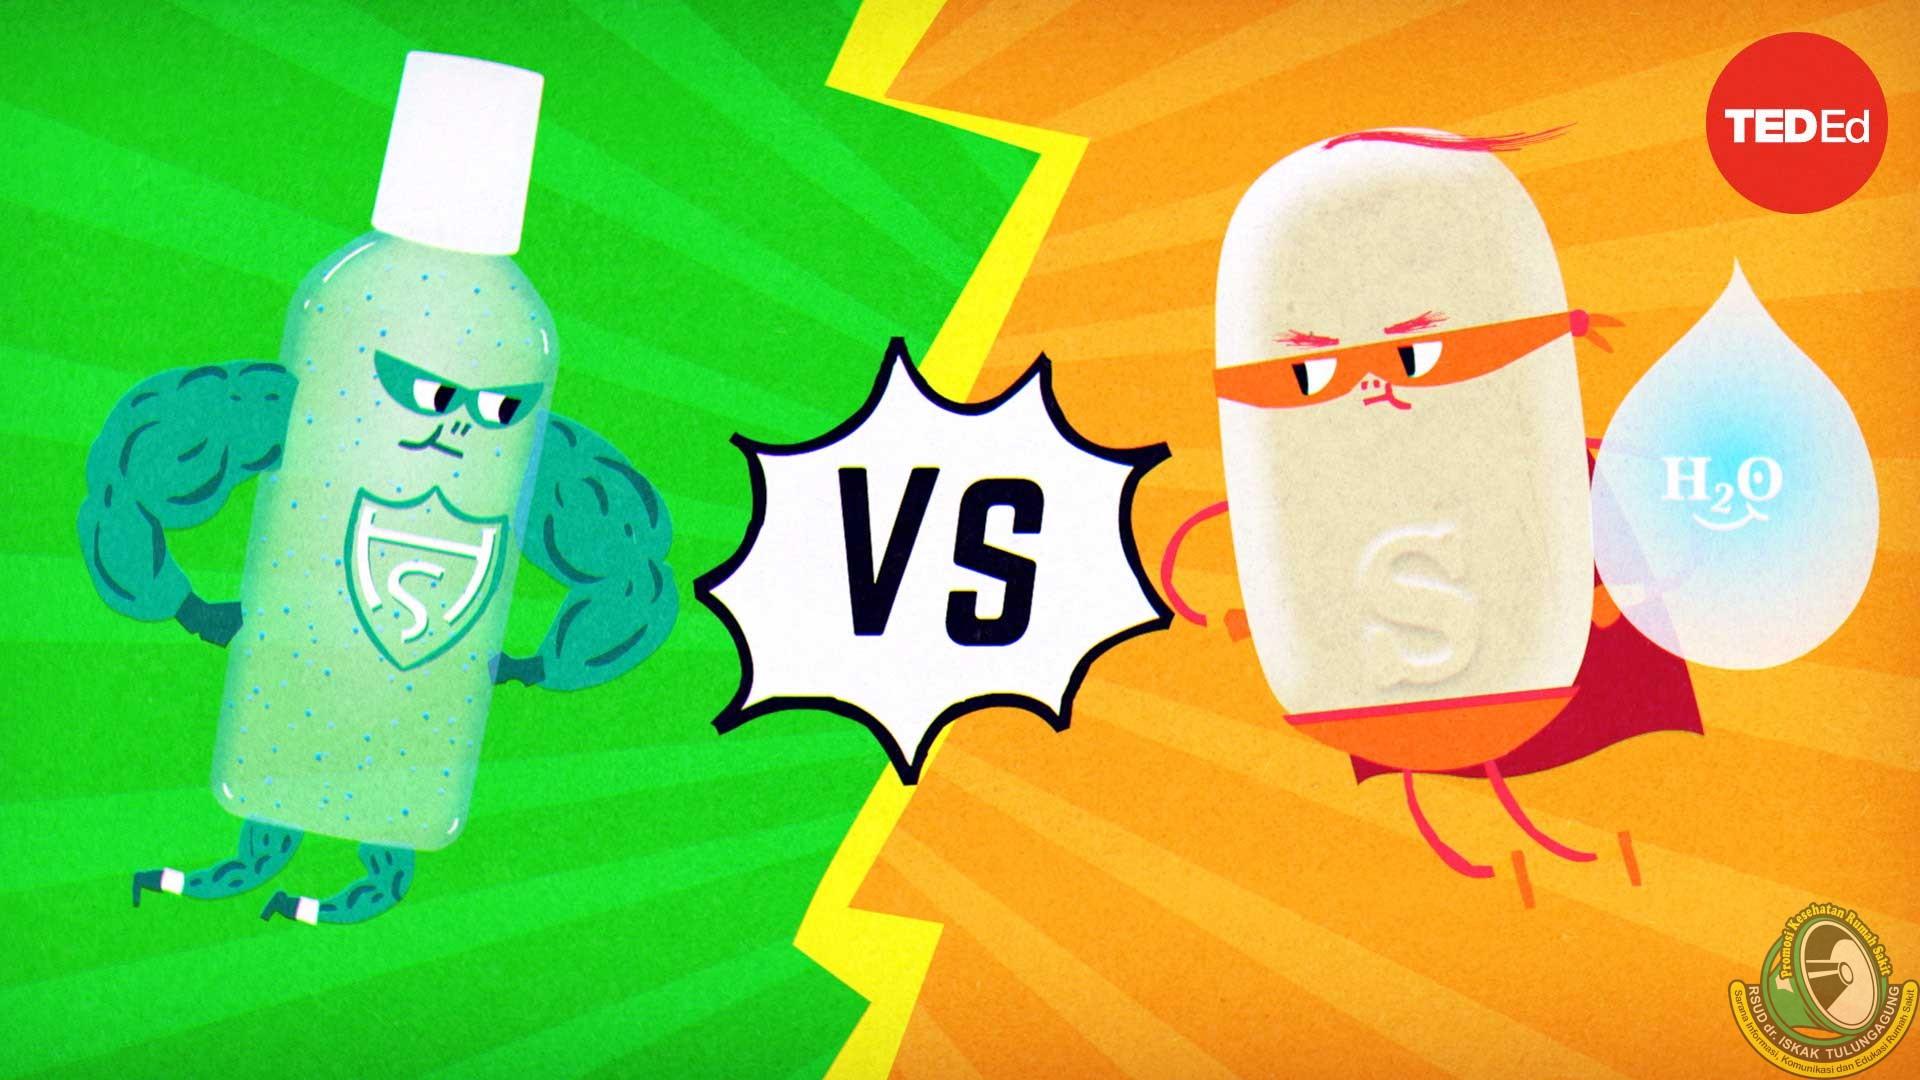 Hand Sanitizer atau Sabun. Mana Yang Lebih Baik?